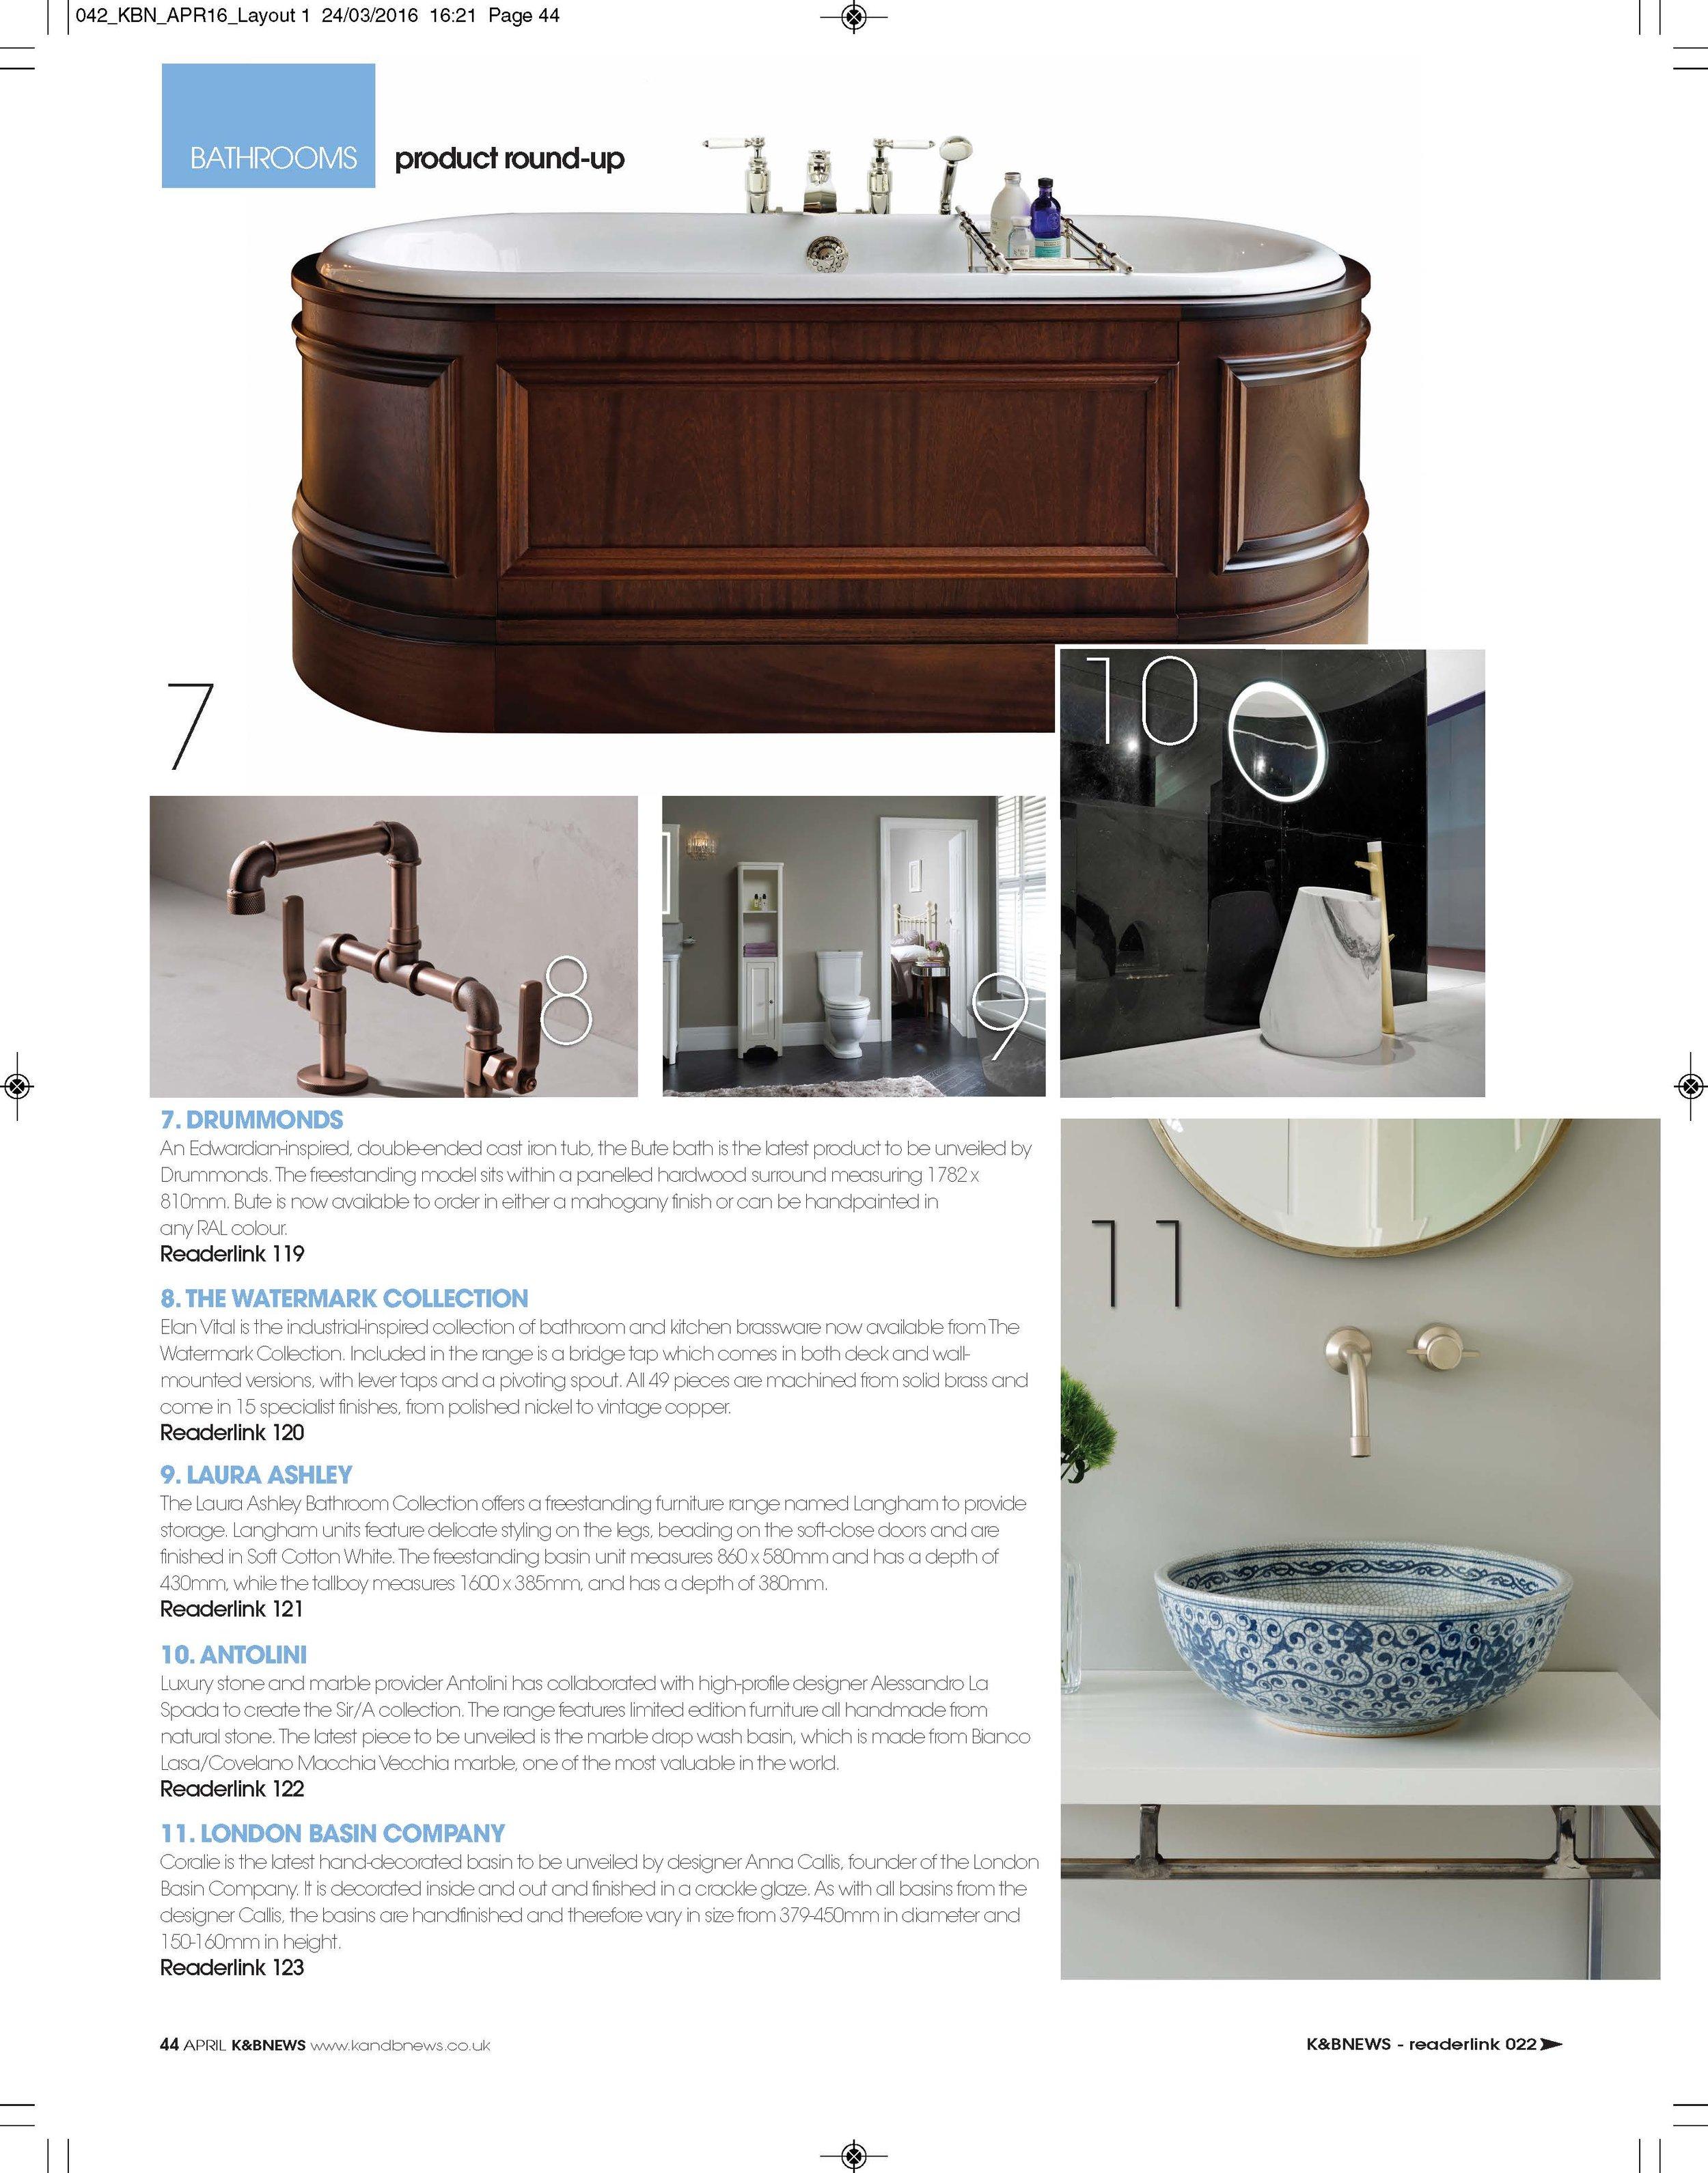 Kitchen & Bathroom News April 2016 LBC.jpg